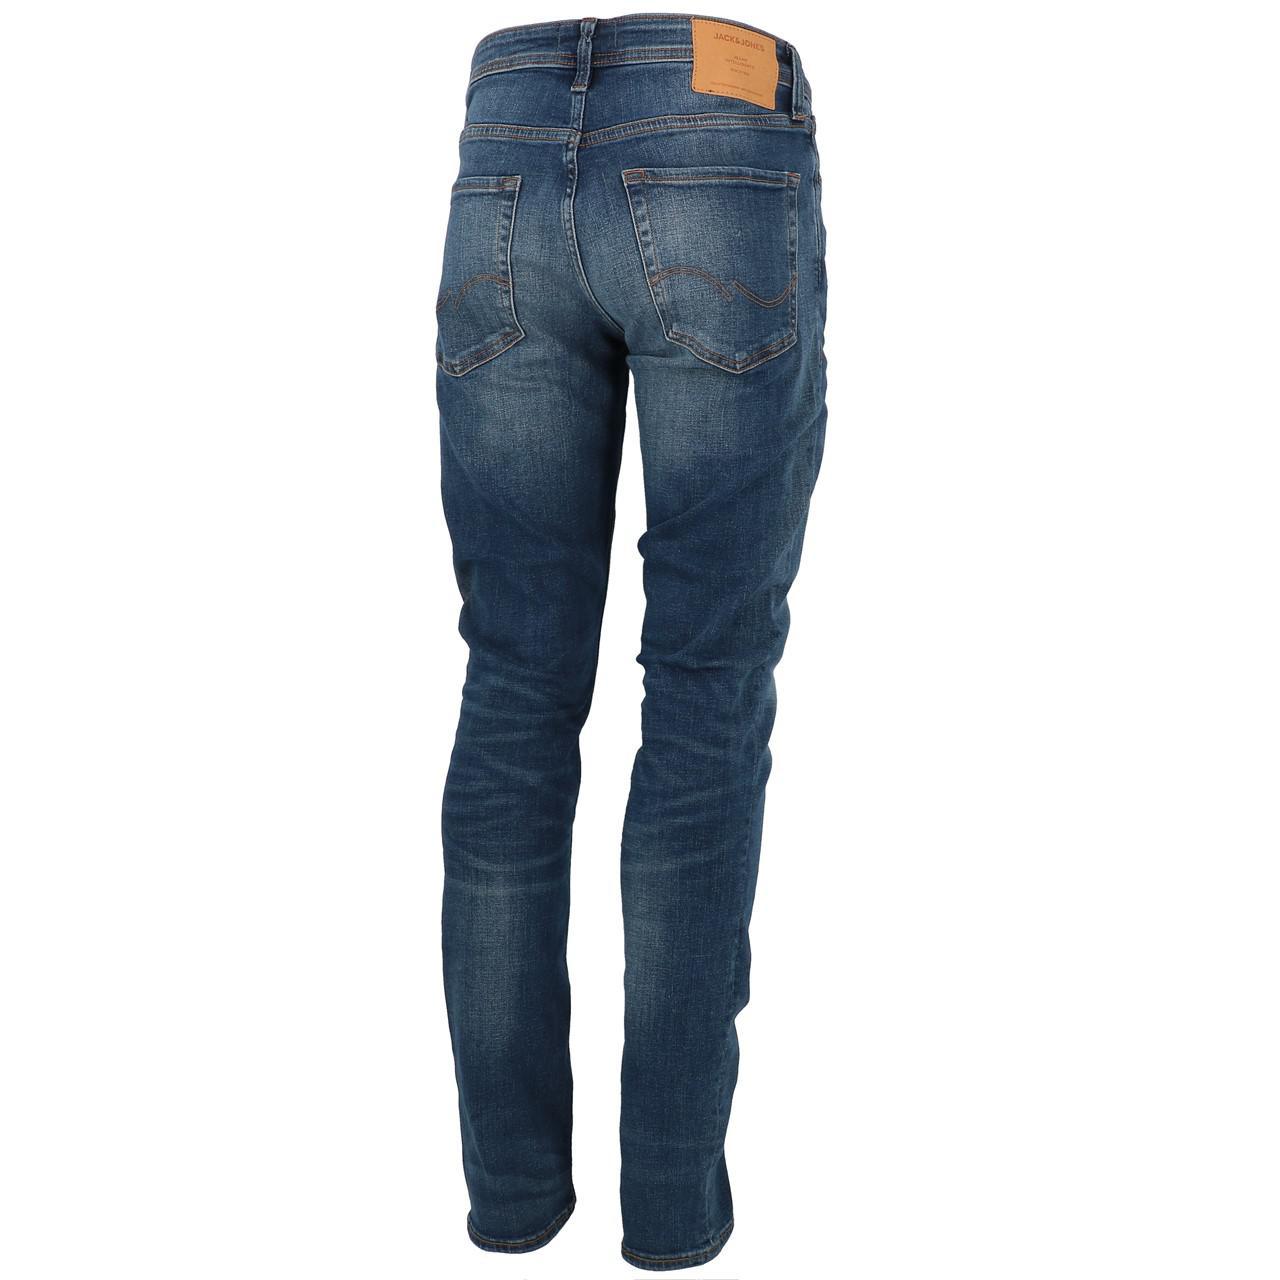 Jeans-Pants-Jack-and-jones-Tim-34-Blue-Denim-Blue-Jeans-19918-New thumbnail 5